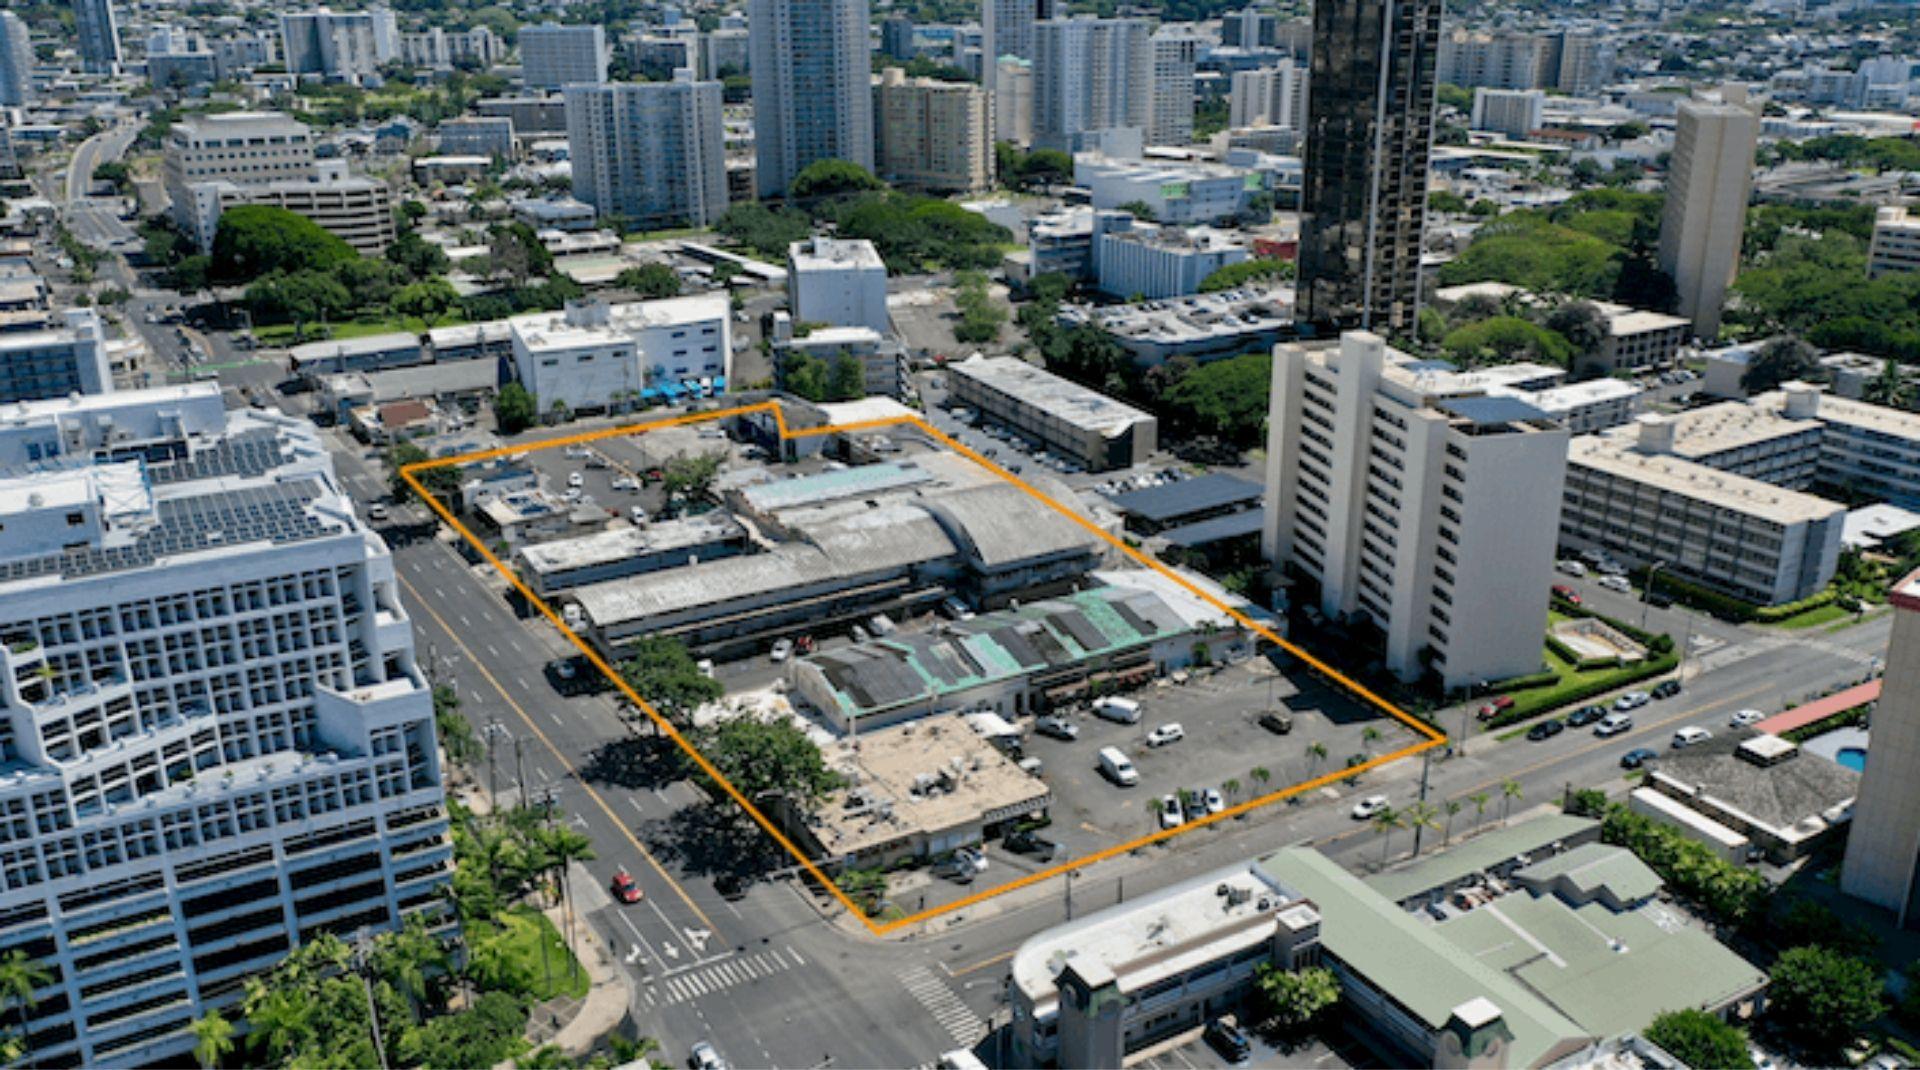 Keeaumoku Towers site plan in Ala Moana, Honolulu, HI